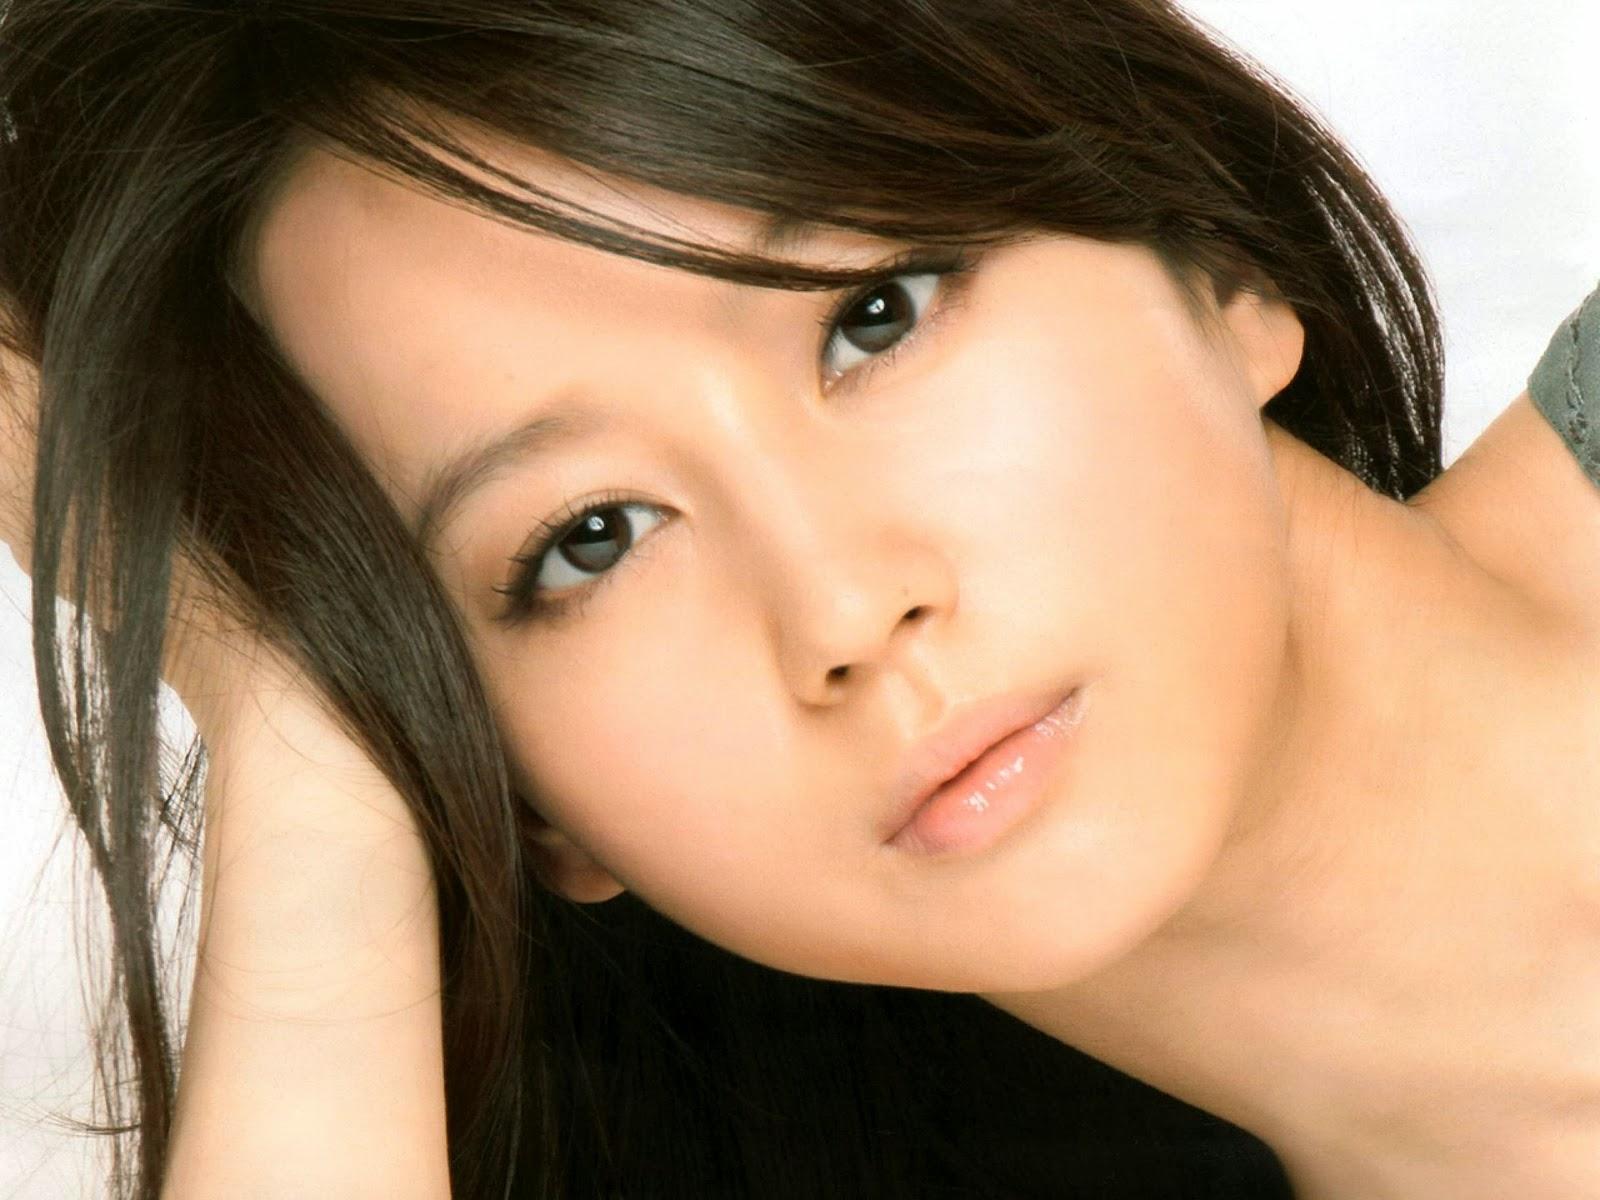 Mami Matsuyama (b. 1988) nude (84 foto and video), Topless, Paparazzi, Boobs, cameltoe 2019